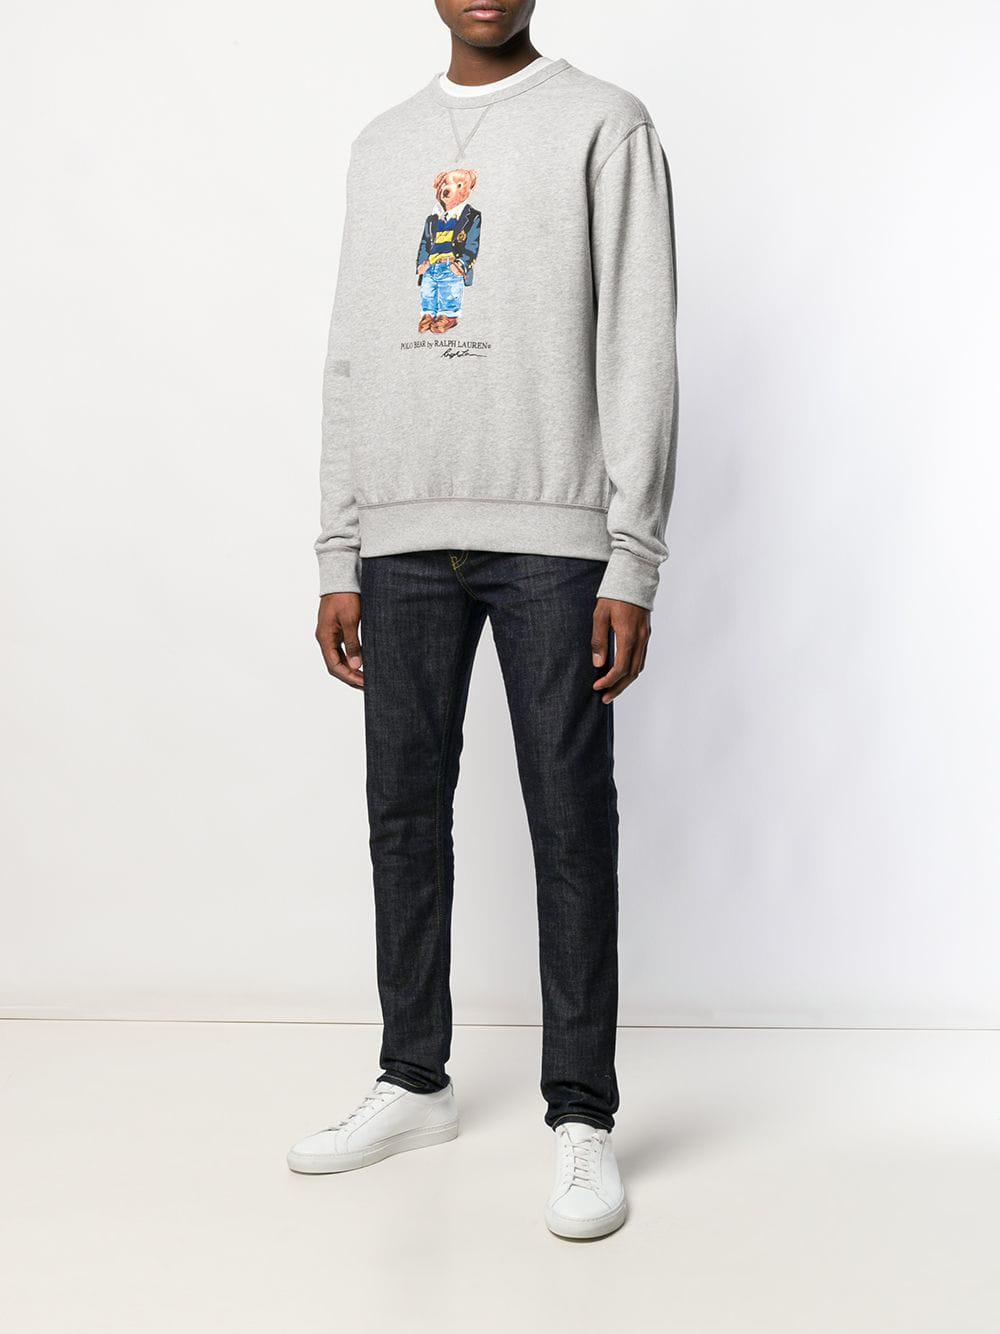 bd82c4575 Polo Ralph Lauren Polo Bear Sweatshirt in Gray for Men - Save 35% - Lyst